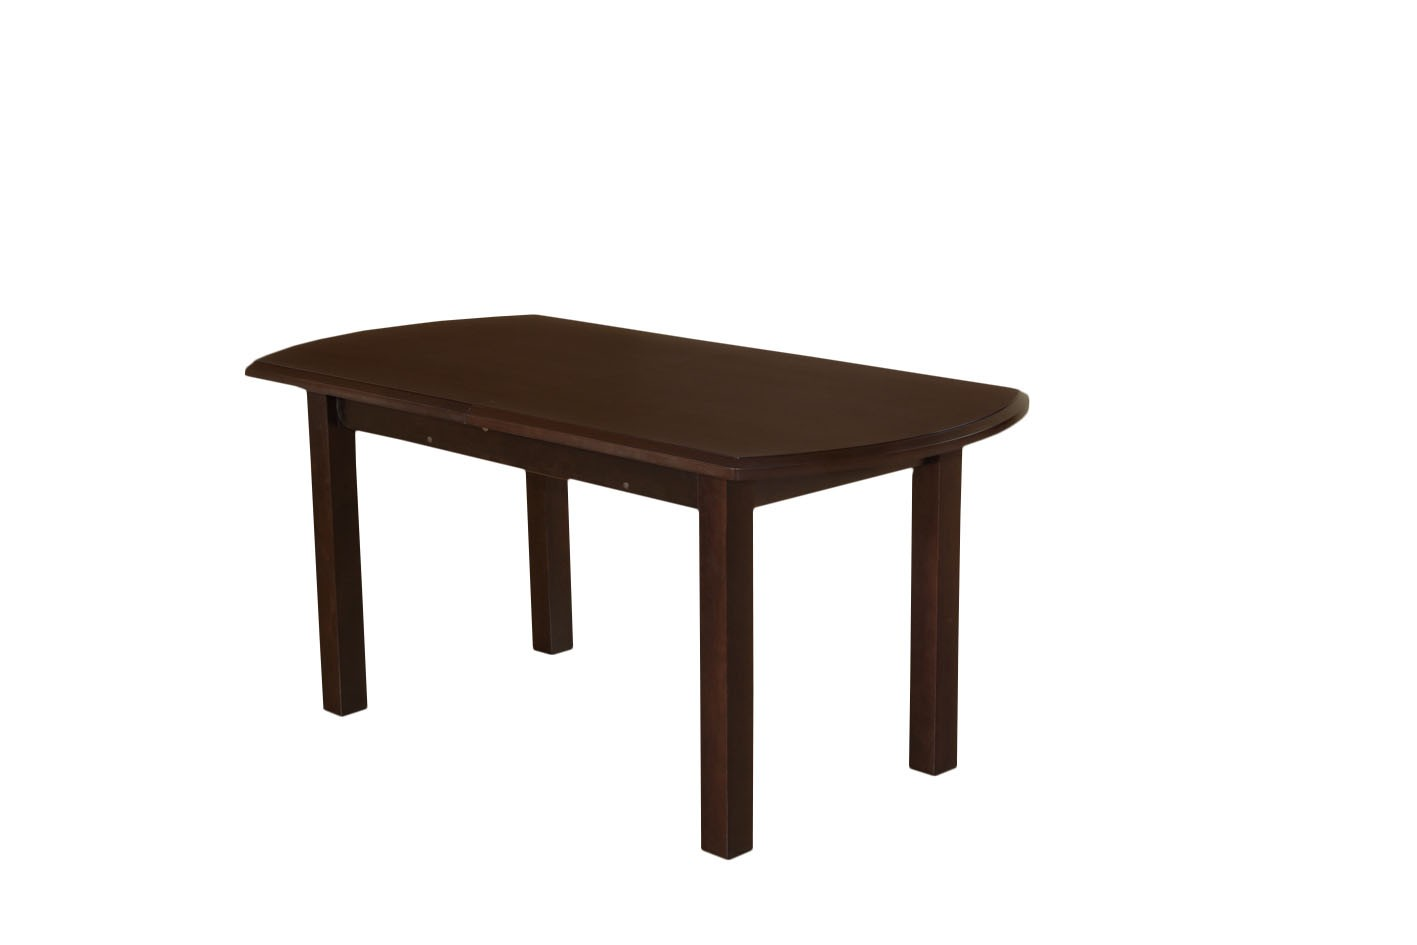 Stół do jadalni SM5 w naturalnej okleinie drewnianej